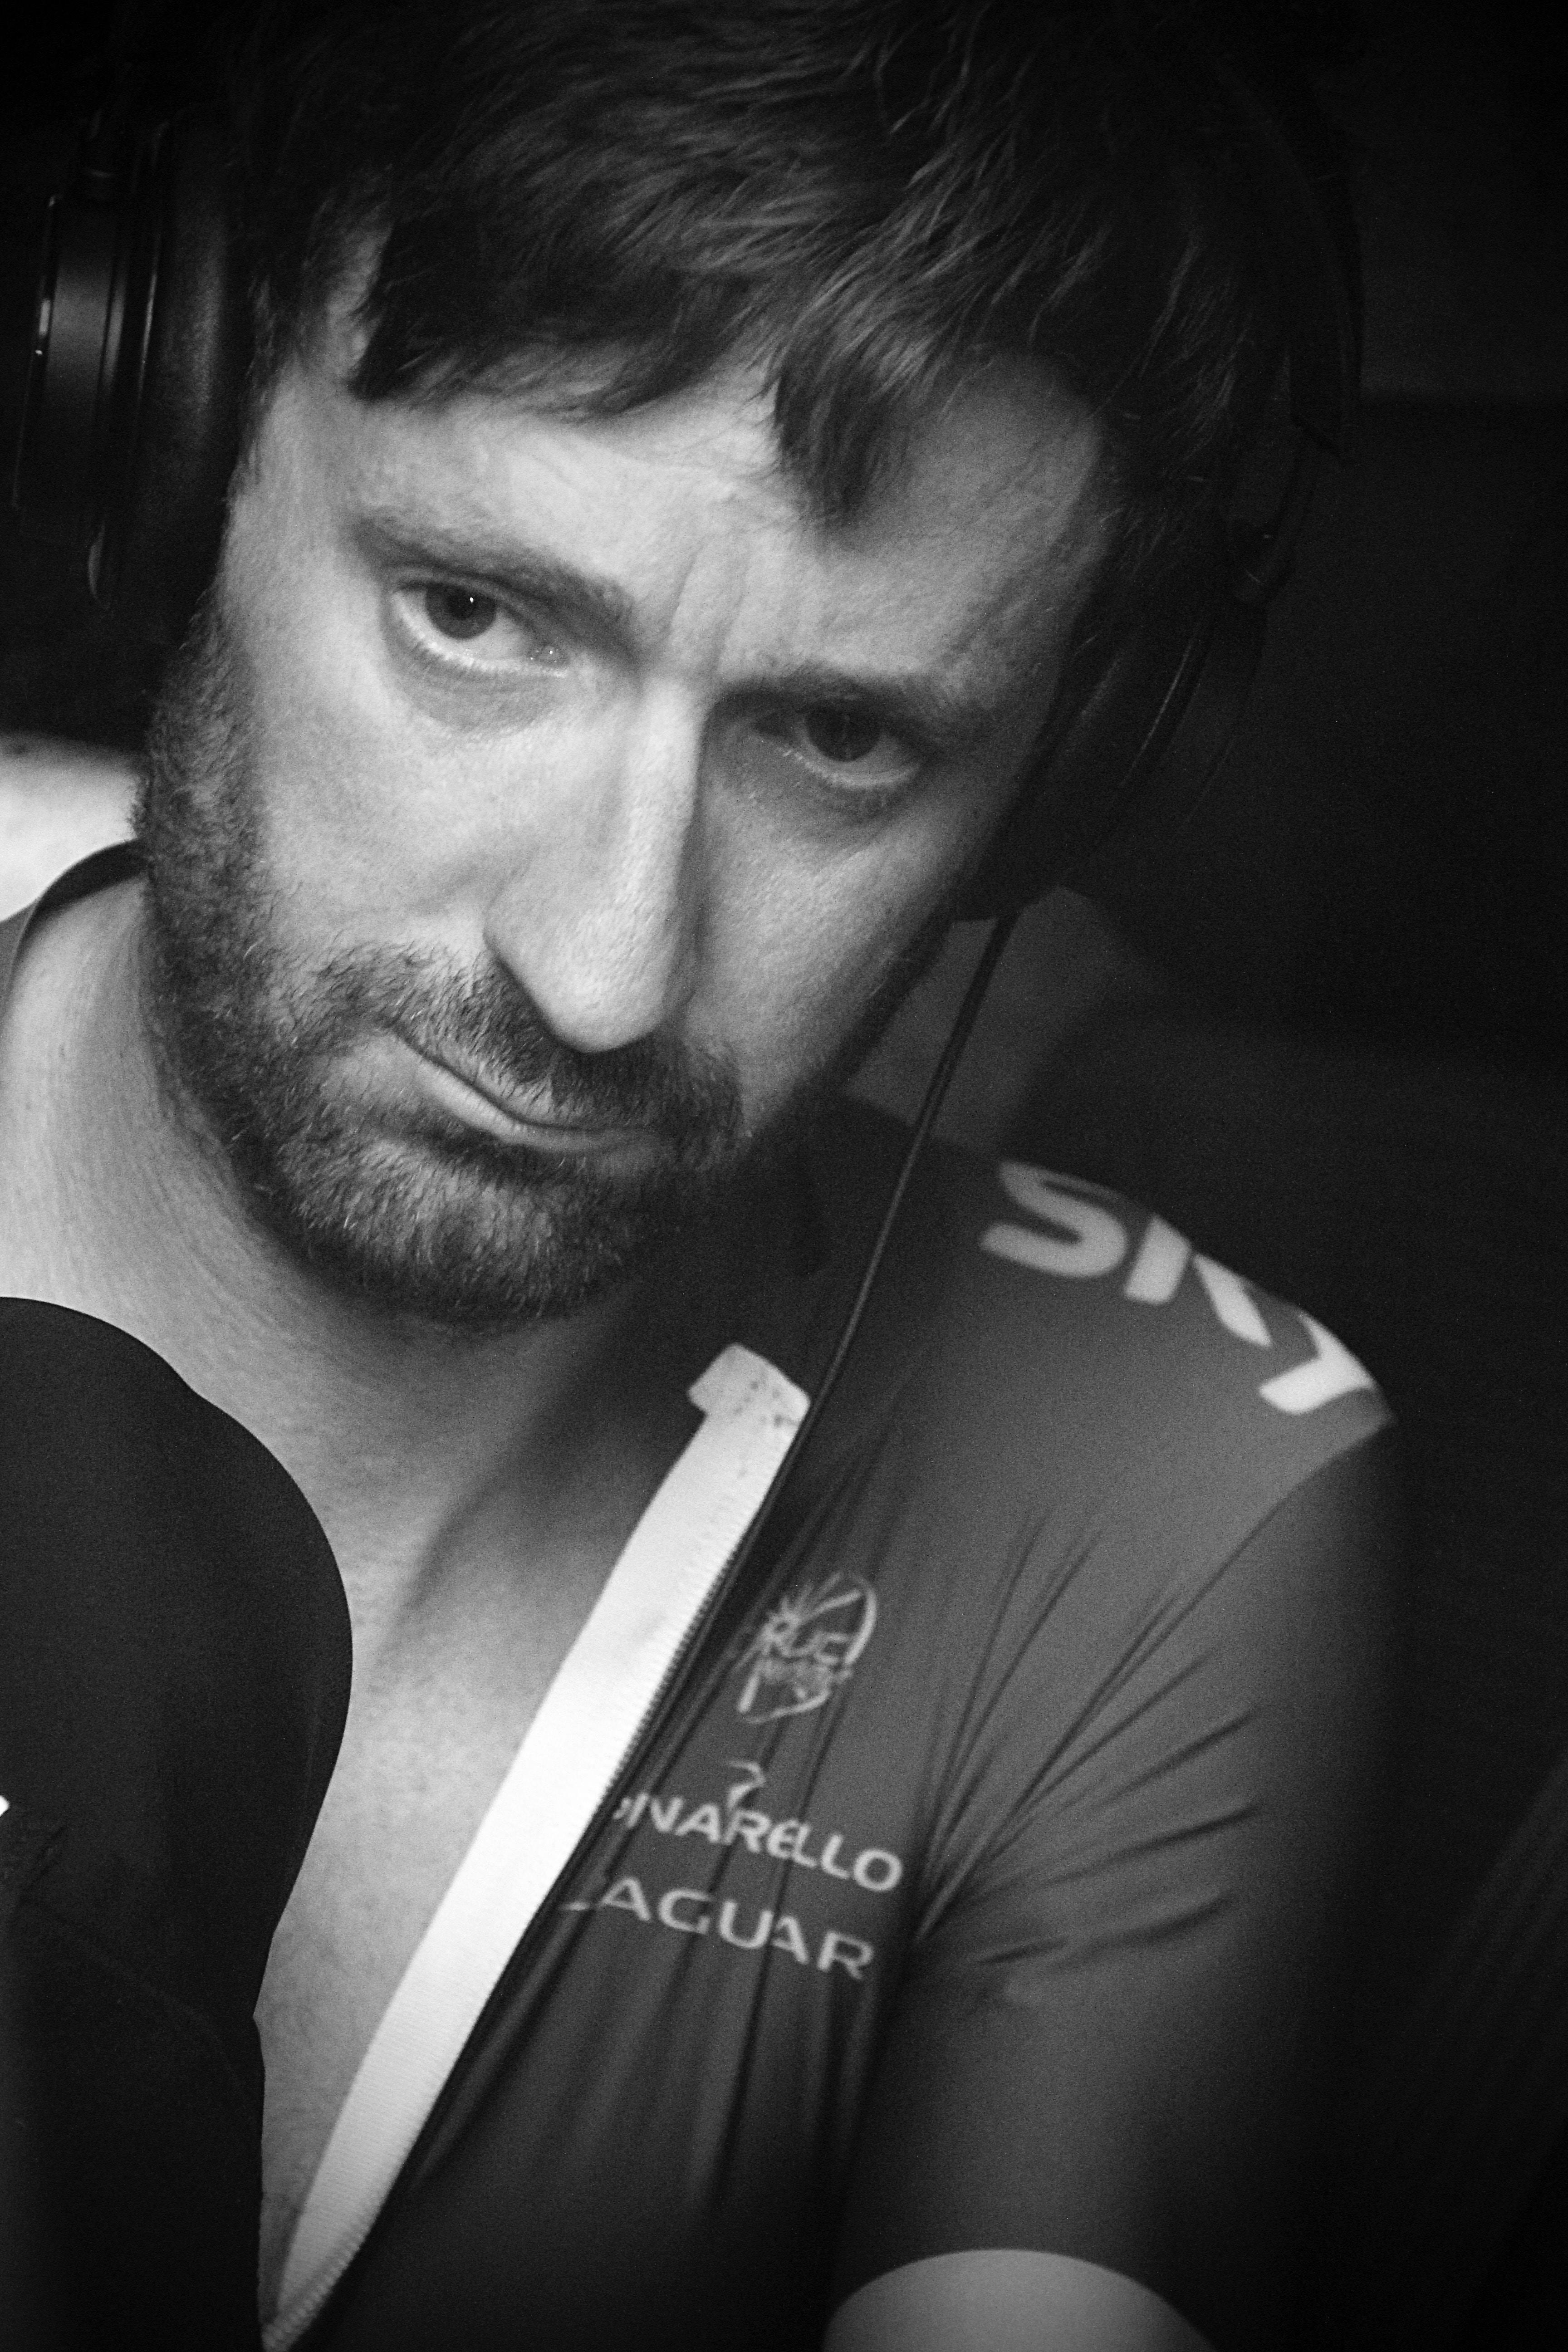 grayscale photo of man wearing corded headphones